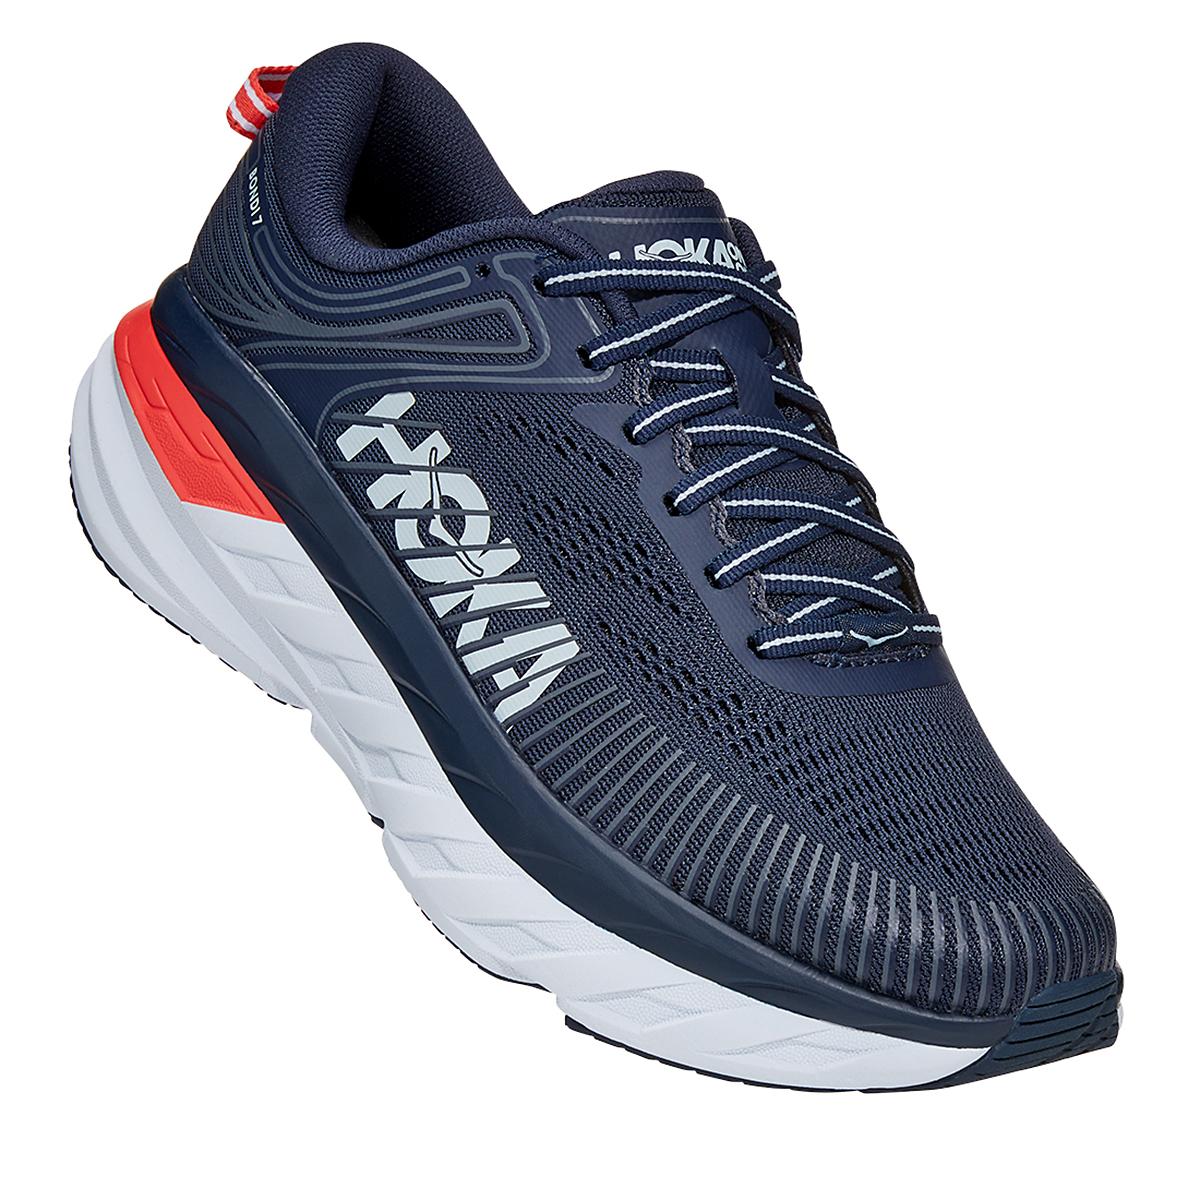 Women's Hoka One One Bondi 7 Running Shoe - Color: Black Iris/Ballad Blue - Size: 6 - Width: Regular, Black Iris/Ballad Blue, large, image 2